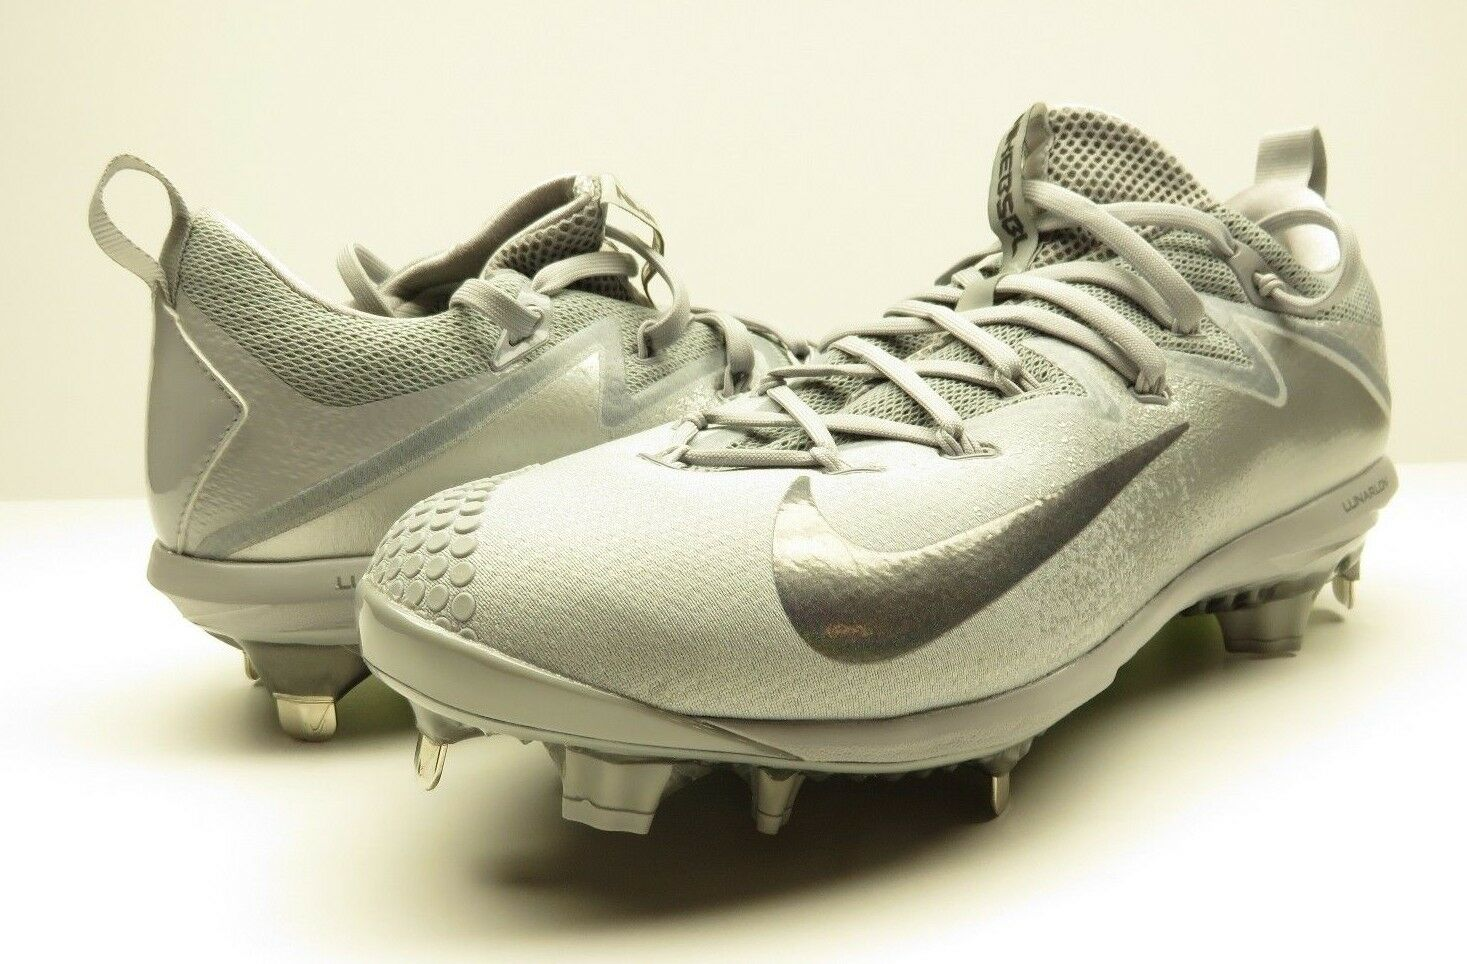 Nuova w / o box nike bsbl silver scarpe da baseball uomo in vietnam